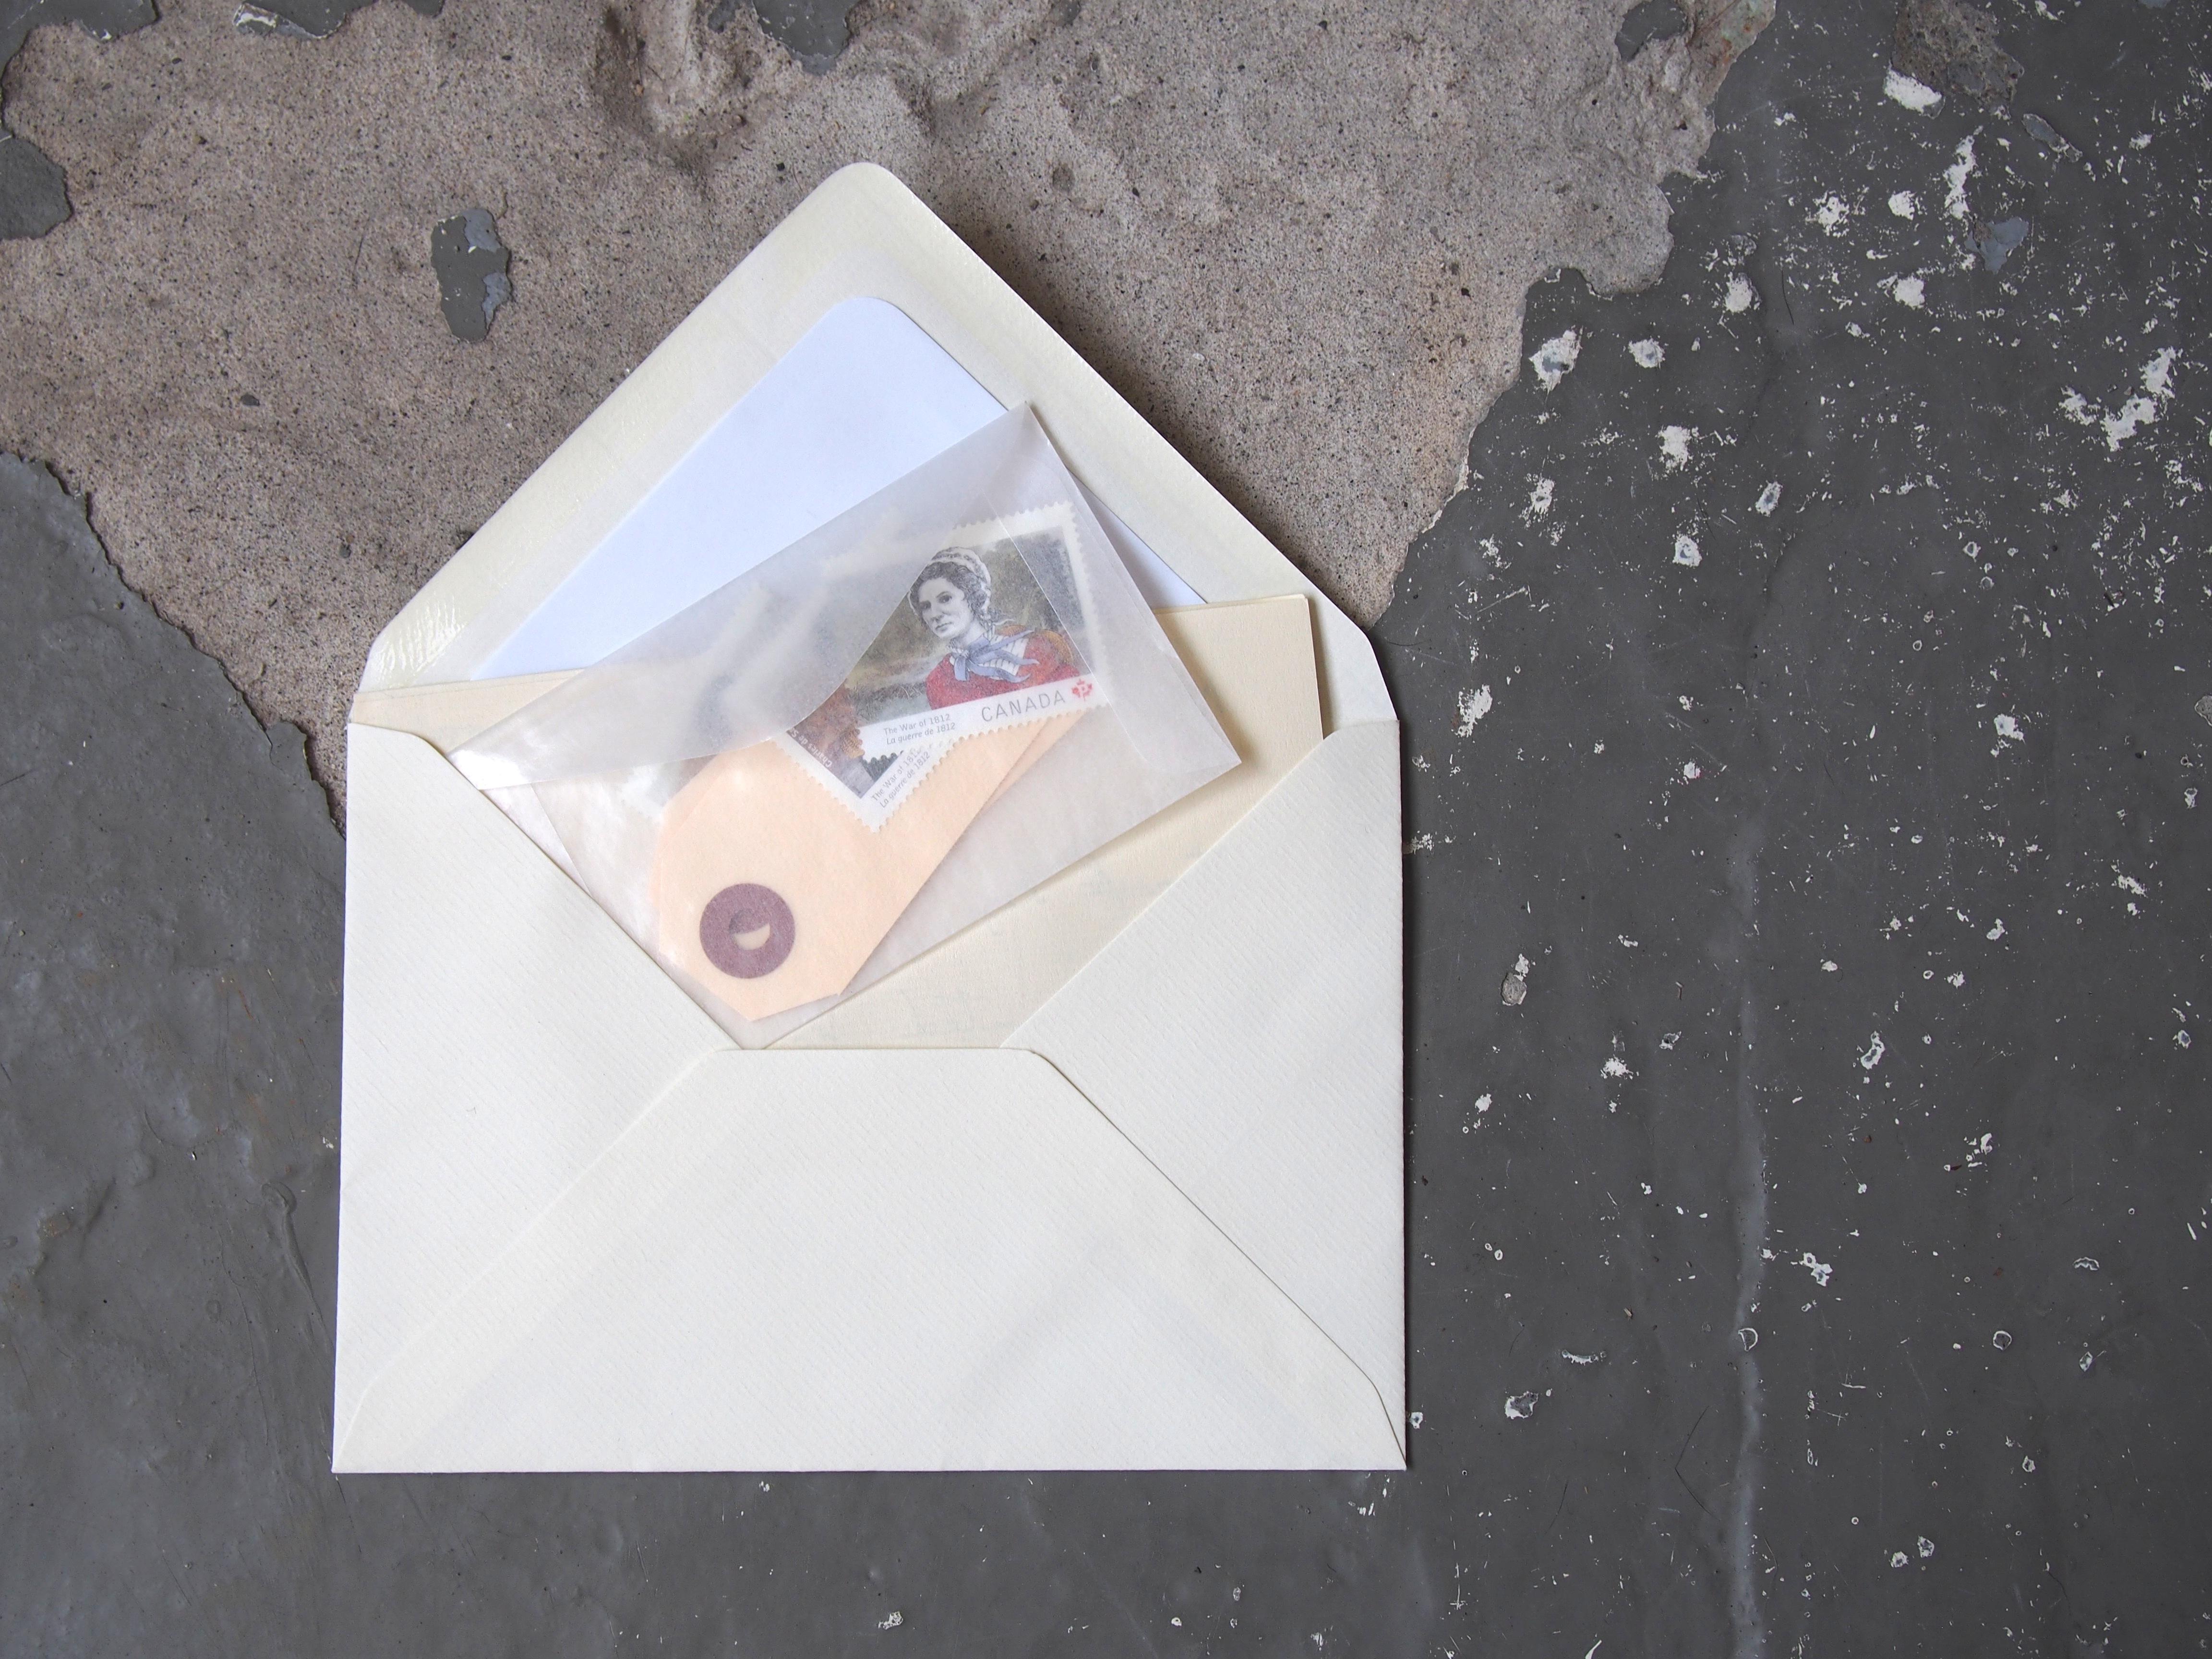 Wonder Pens Blog Glassine Envelopes Snail Mail Letter Writing Club wonderpens.ca Toronto Canada